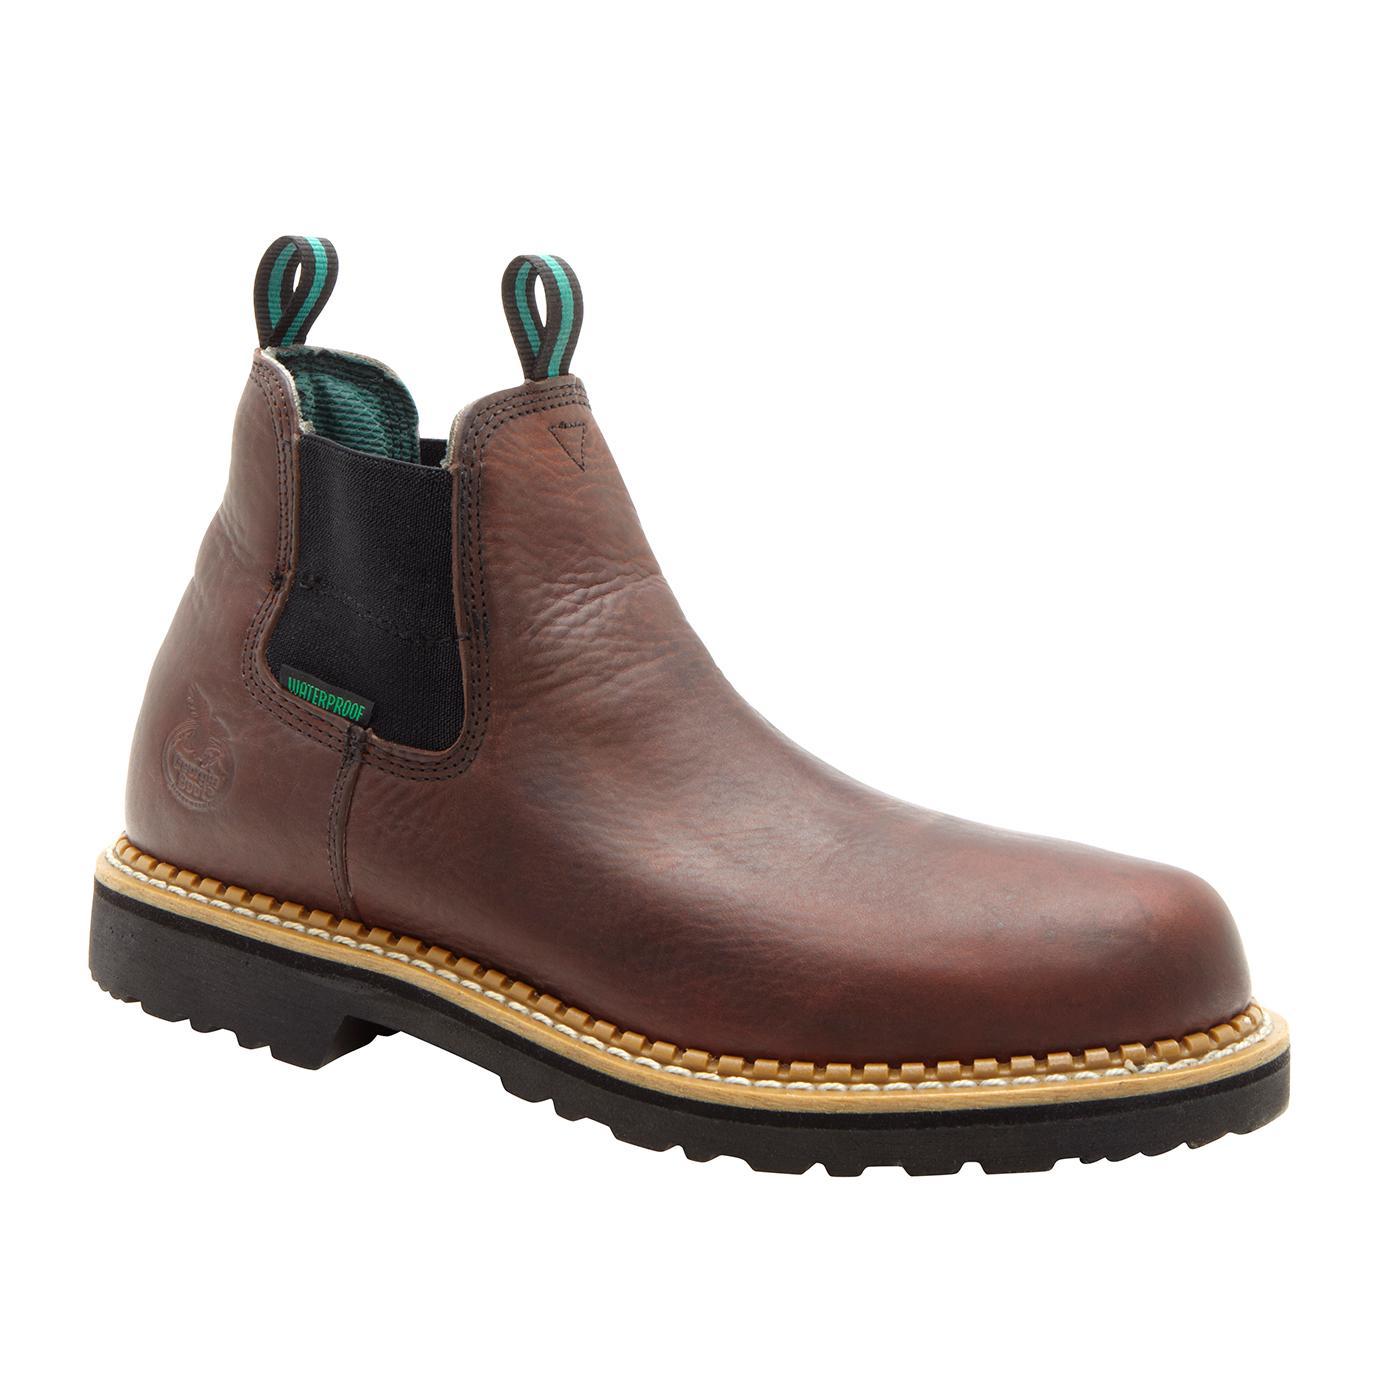 Georgia Giant Waterproof High Romeo Boot, , large